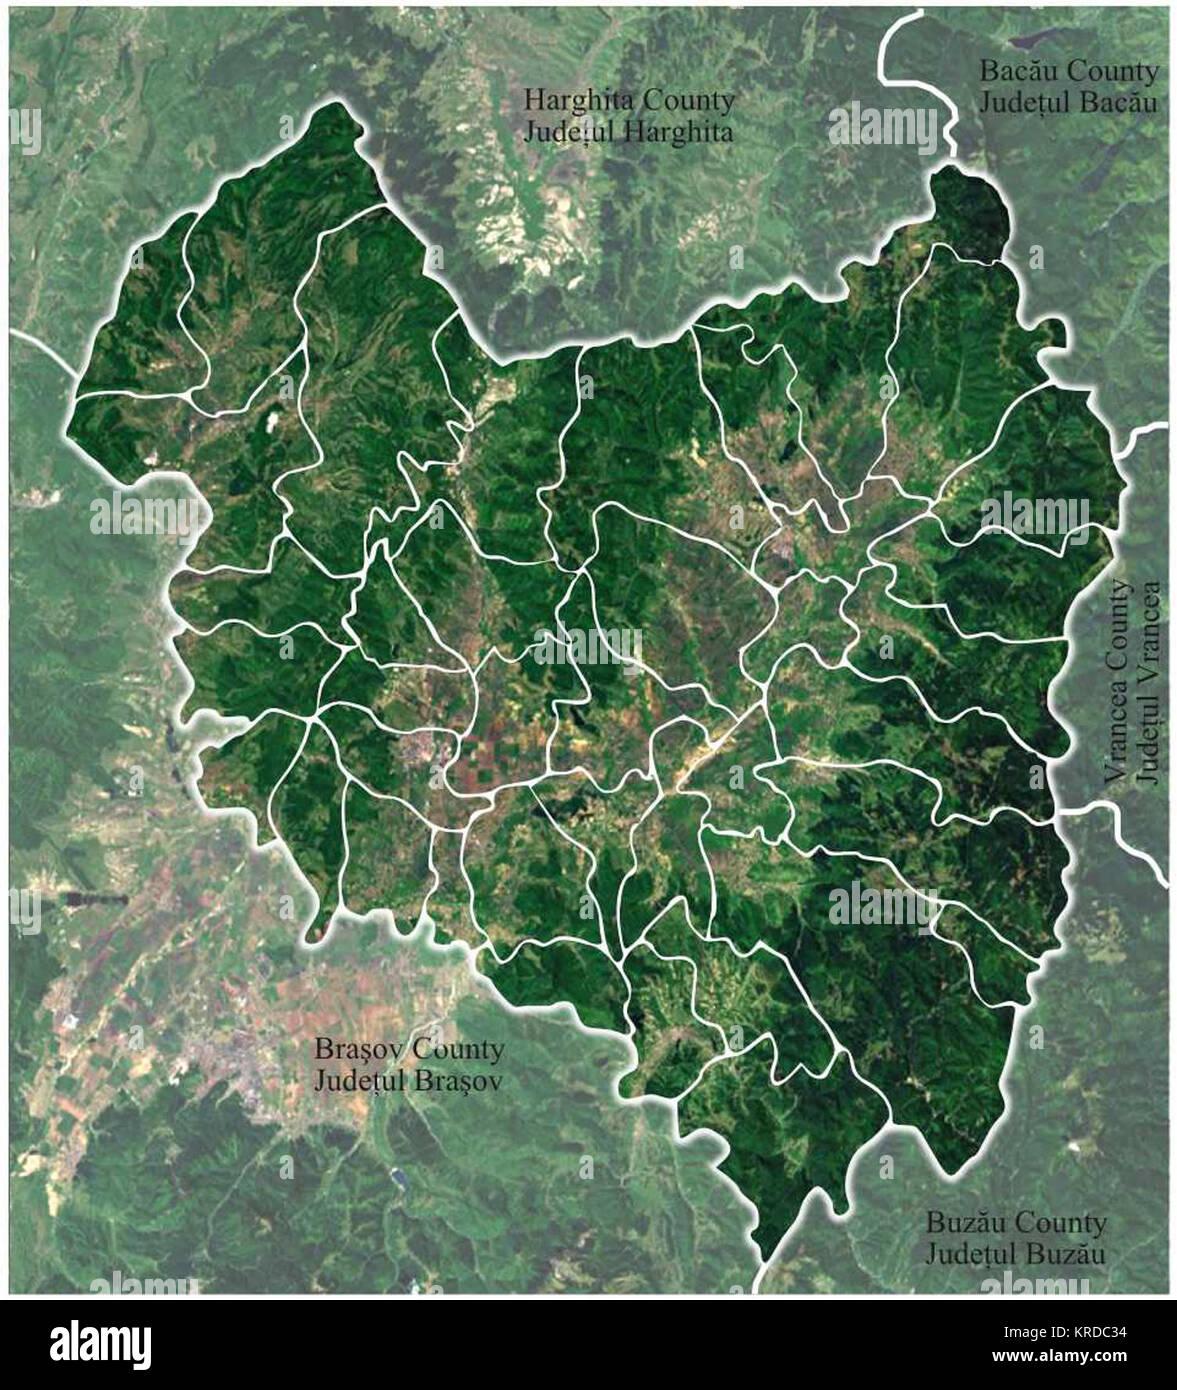 Romania Covasna Location map Stock Photo: 169325272 - Alamy